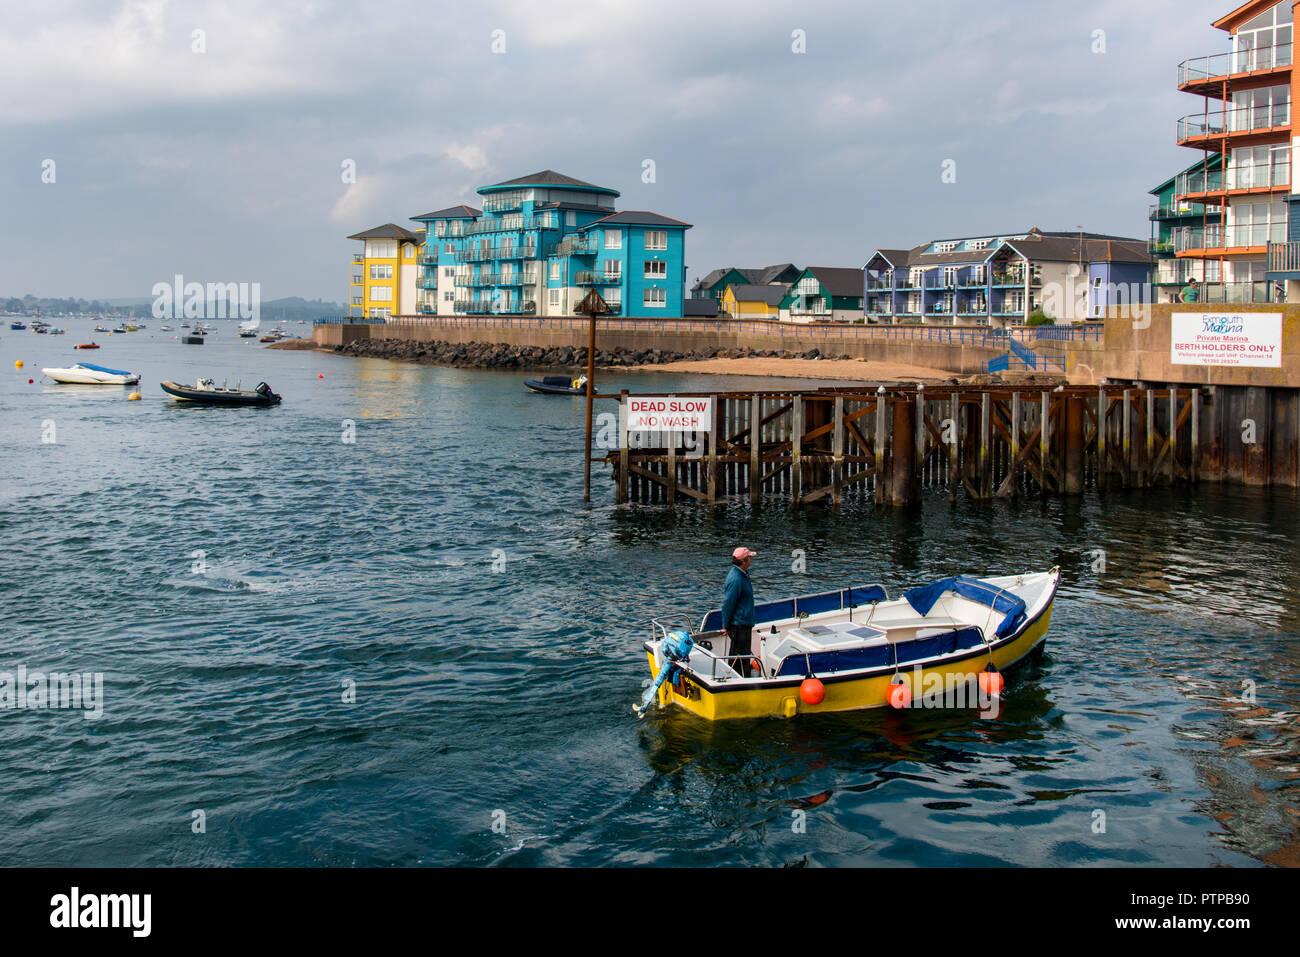 EXMOUTH, DEVON, UK - 05OCT2018:  Yellow boat entering Exmouth Docks - Stock Image